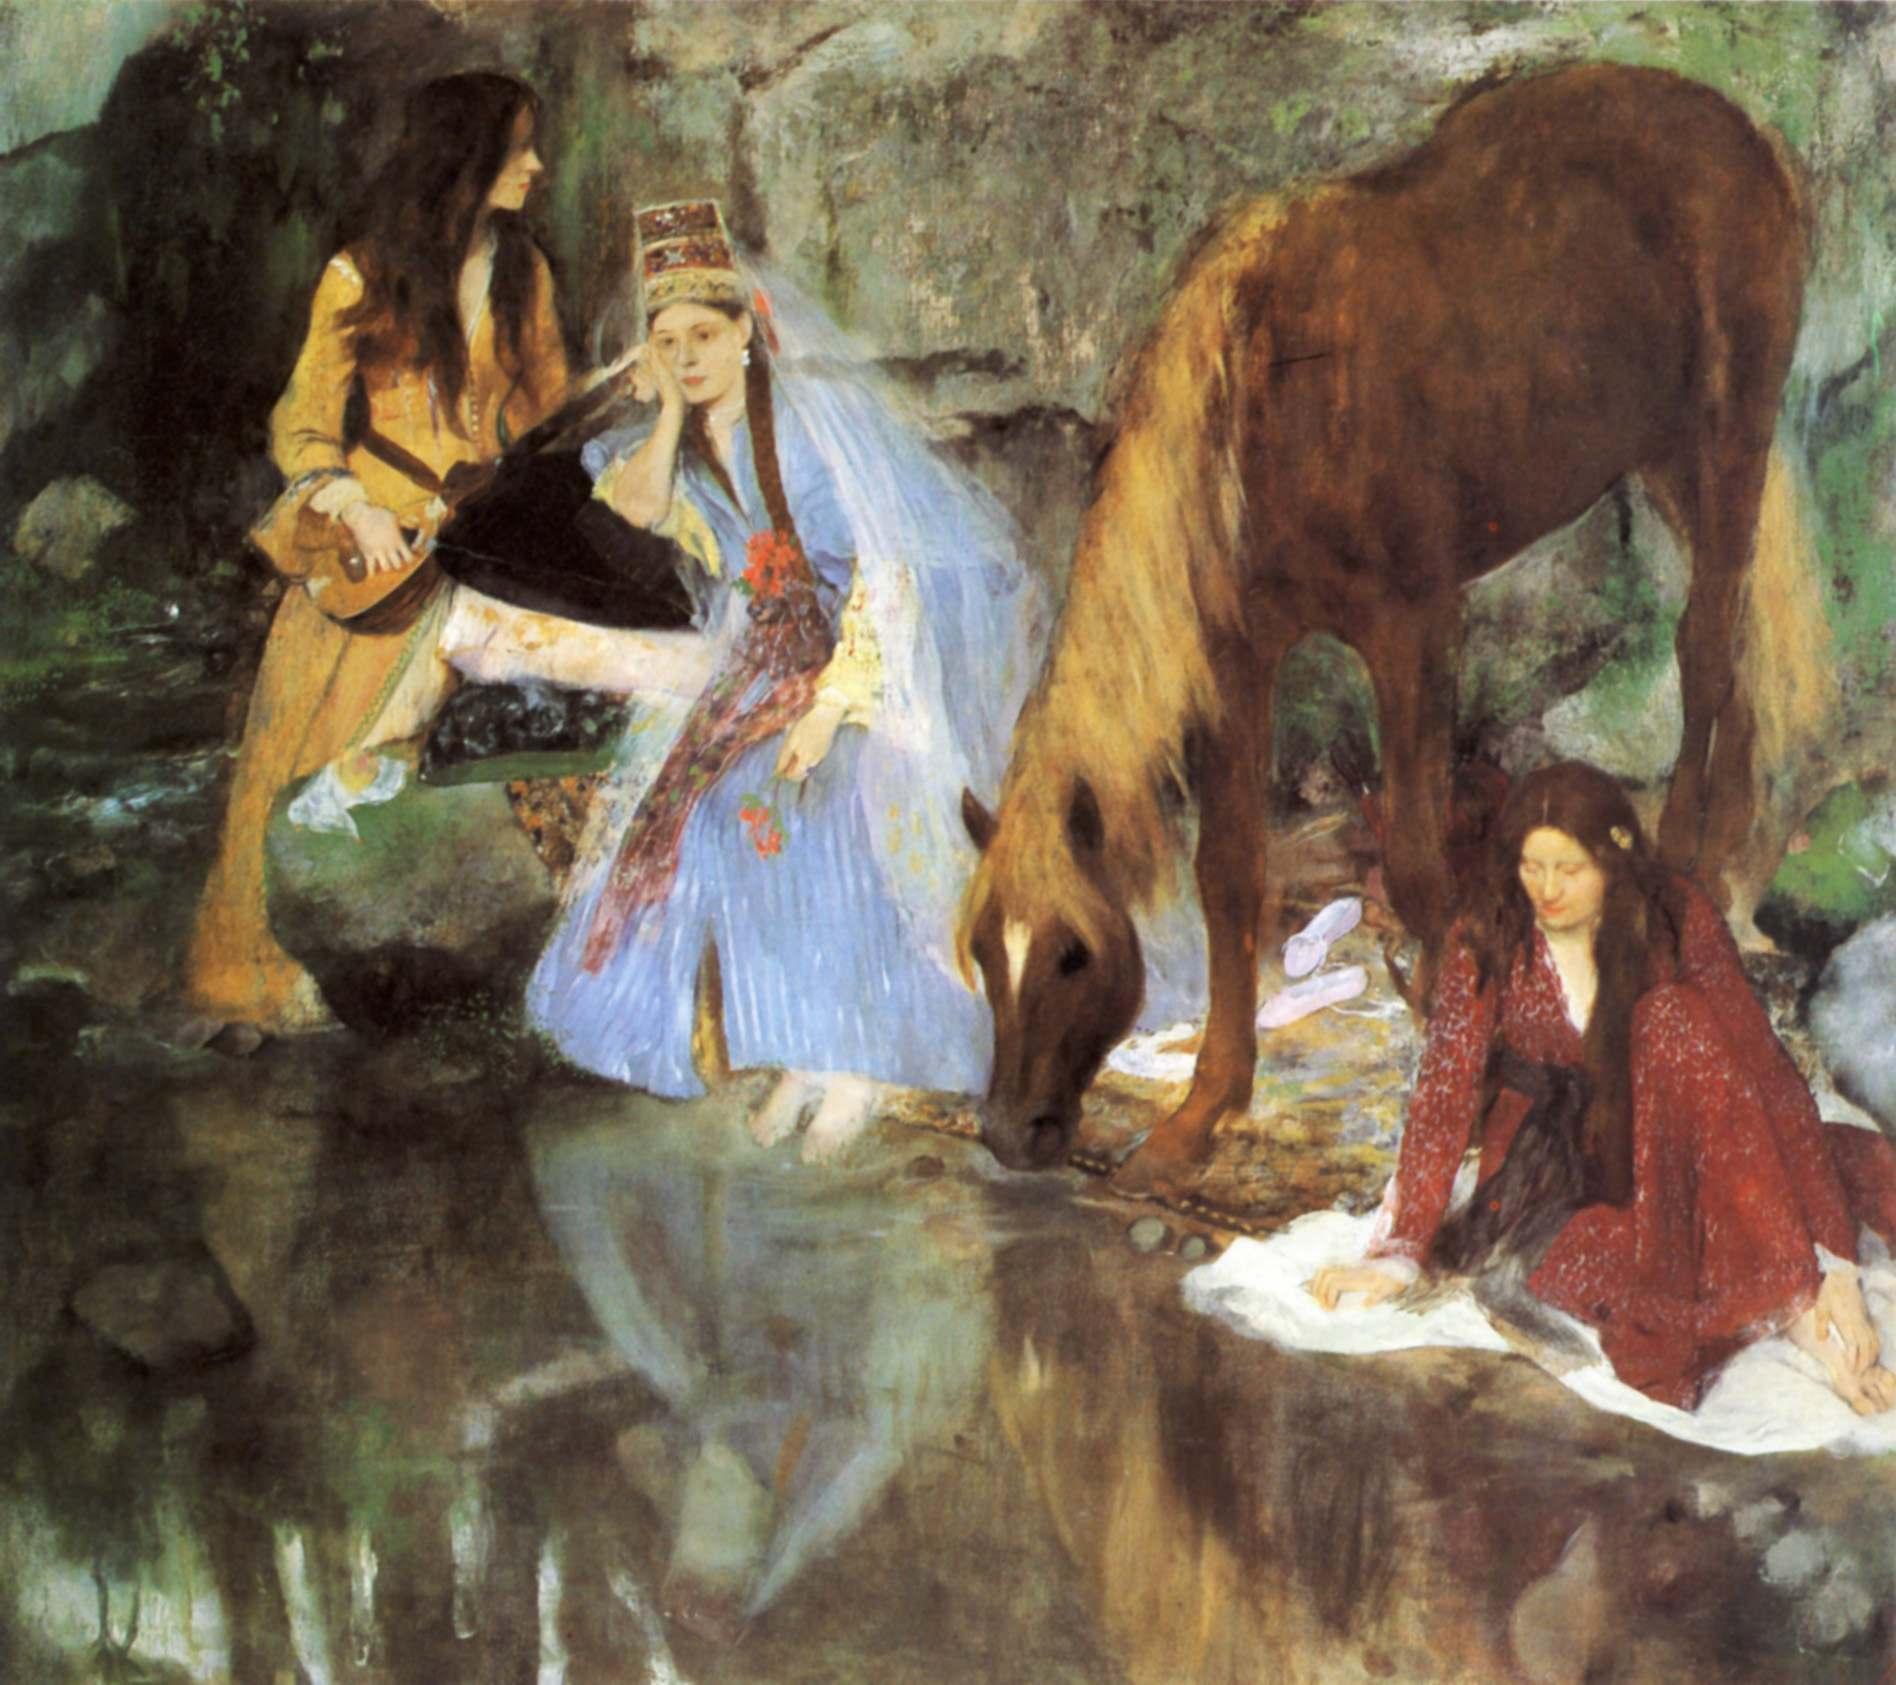 М-ль Фиокр в балете <Источник> - Дега Эдгар  ( Edgar Degas ) фото